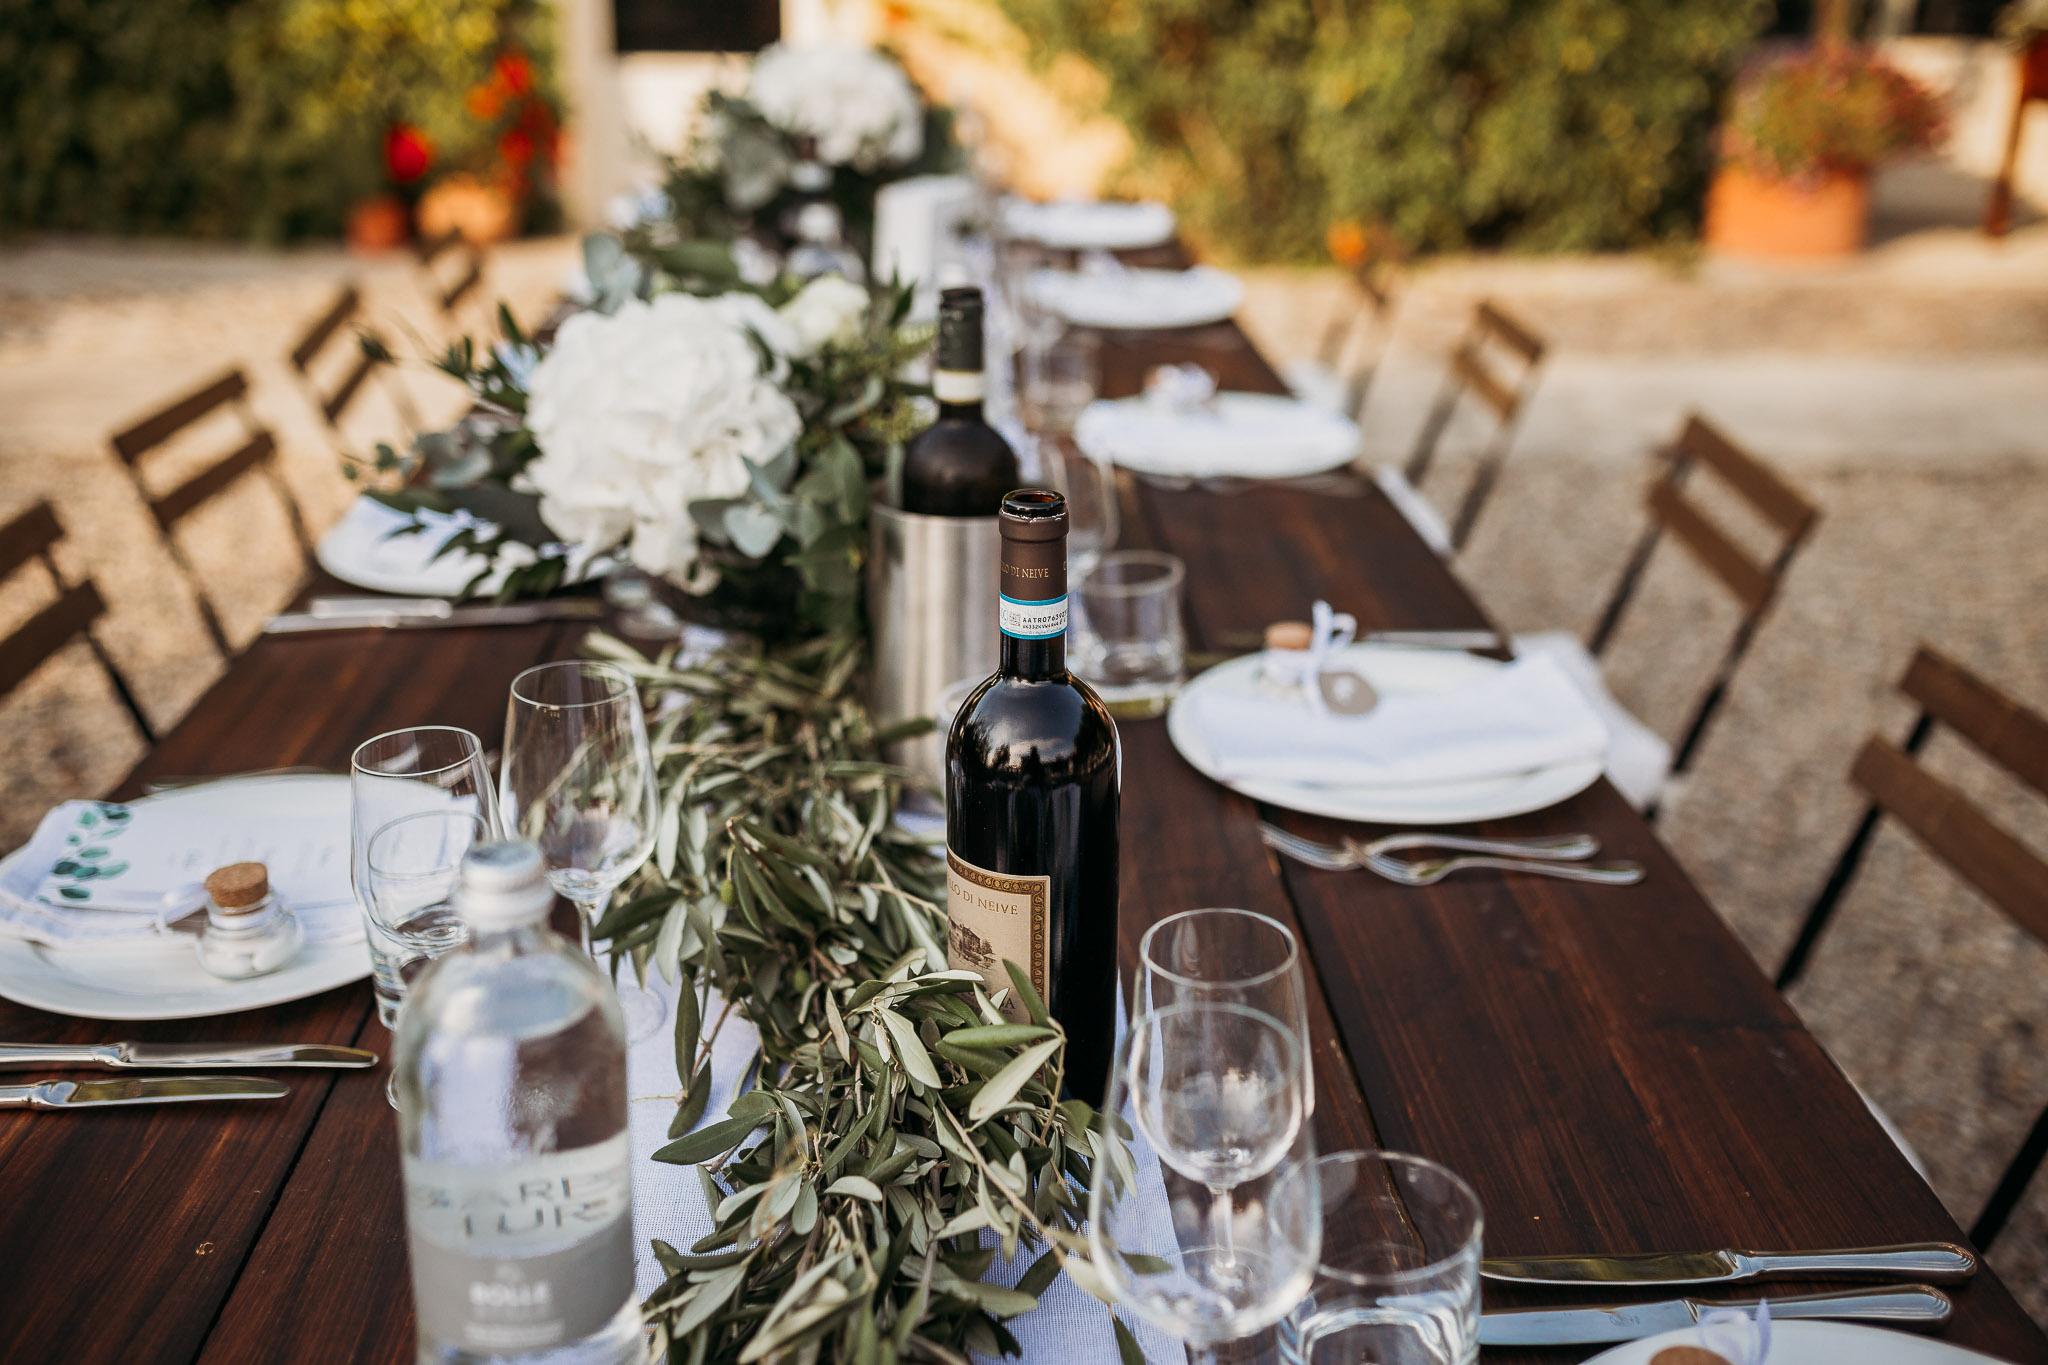 Table ready for wedding reception in the courtyard at La Villa Hotel, Mombaruzzo